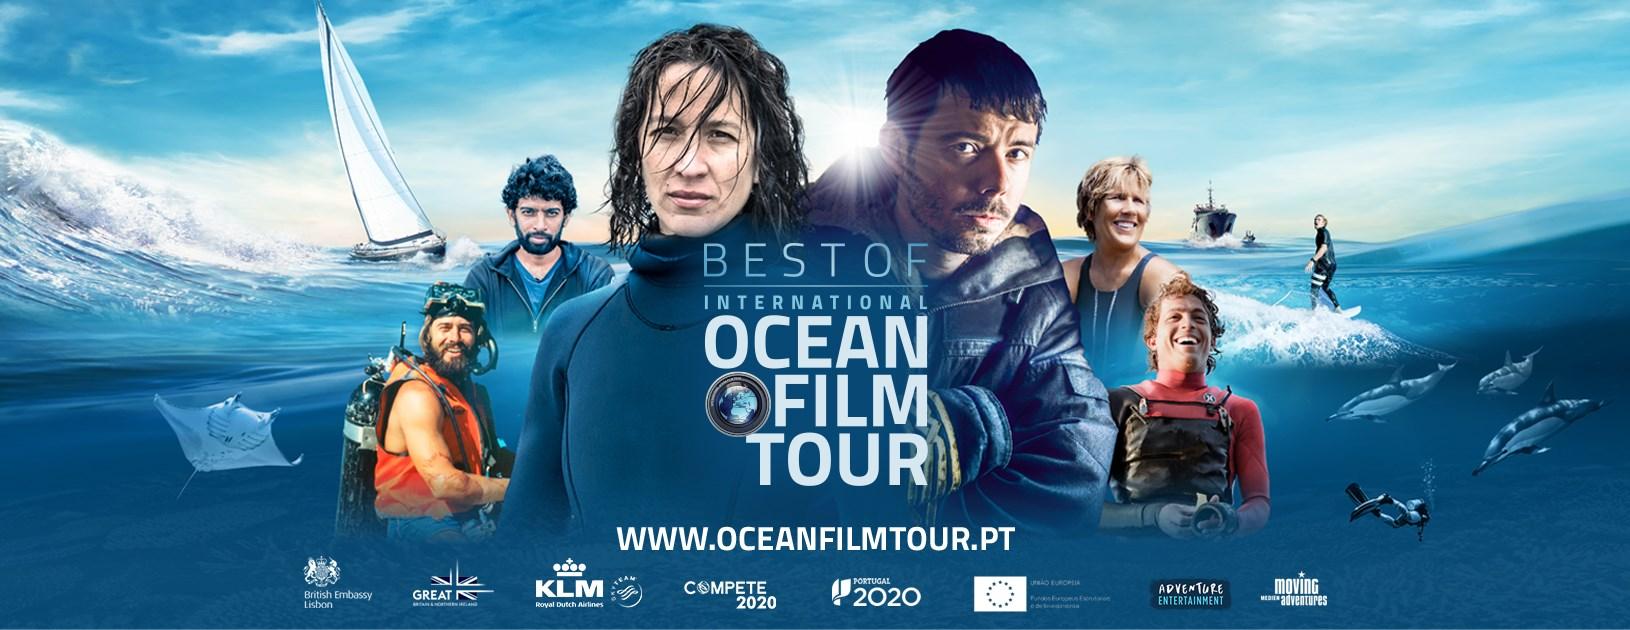 International Ocean Film Tour Best of - Figueira da Foz